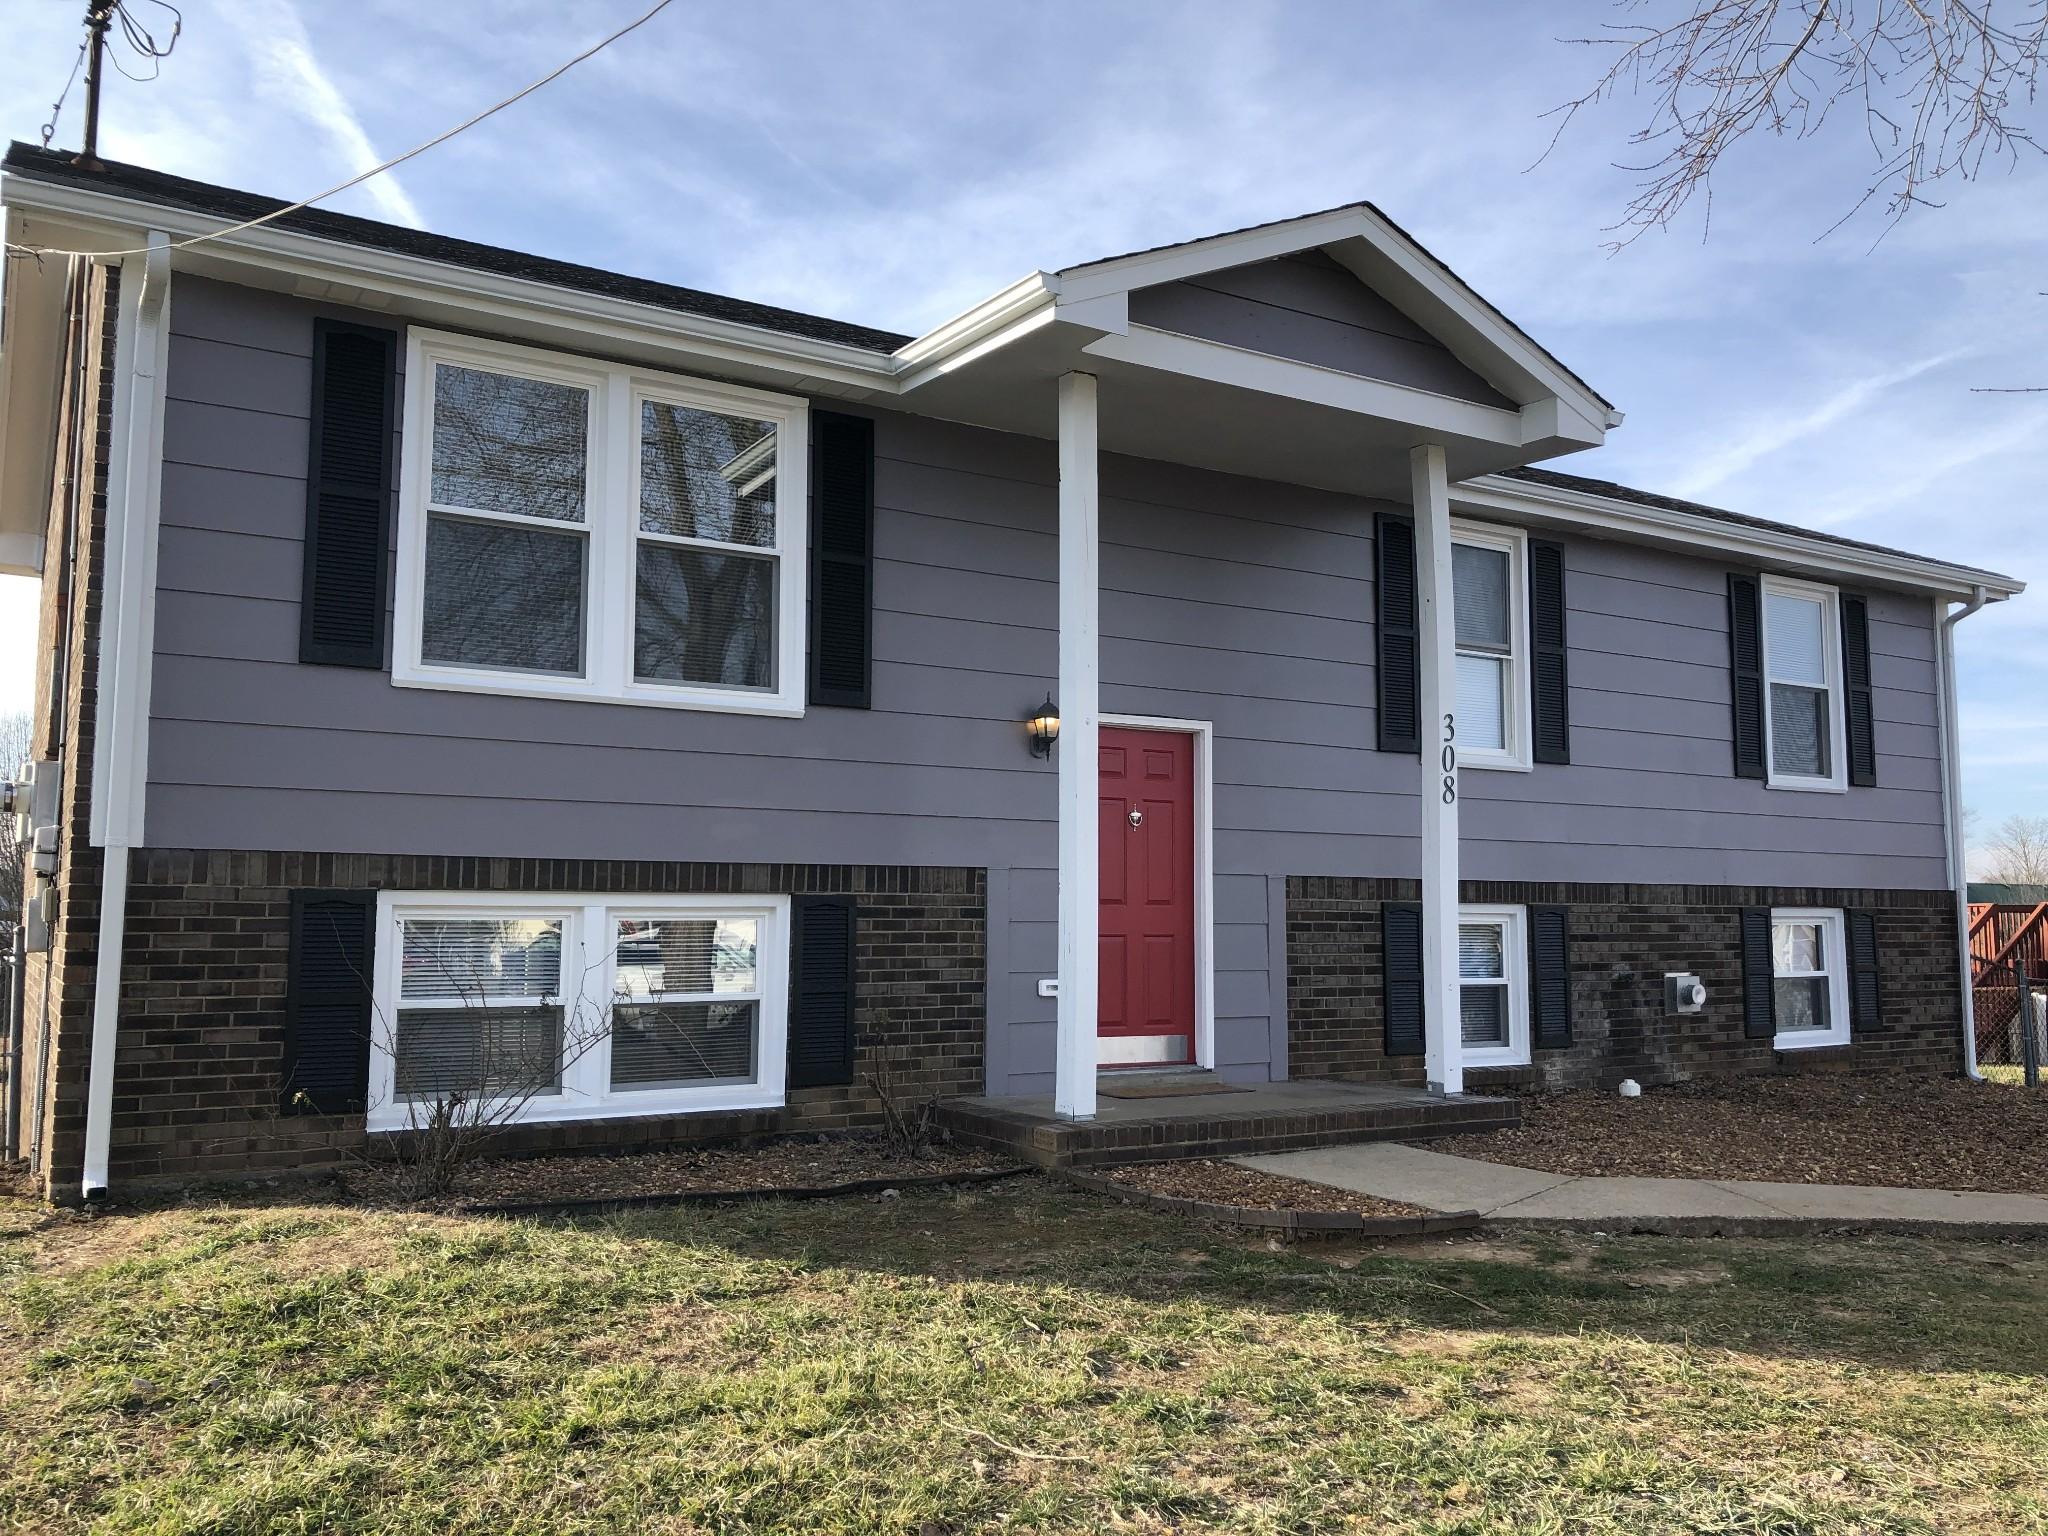 308 Northridge Dr Property Photo - Clarksville, TN real estate listing